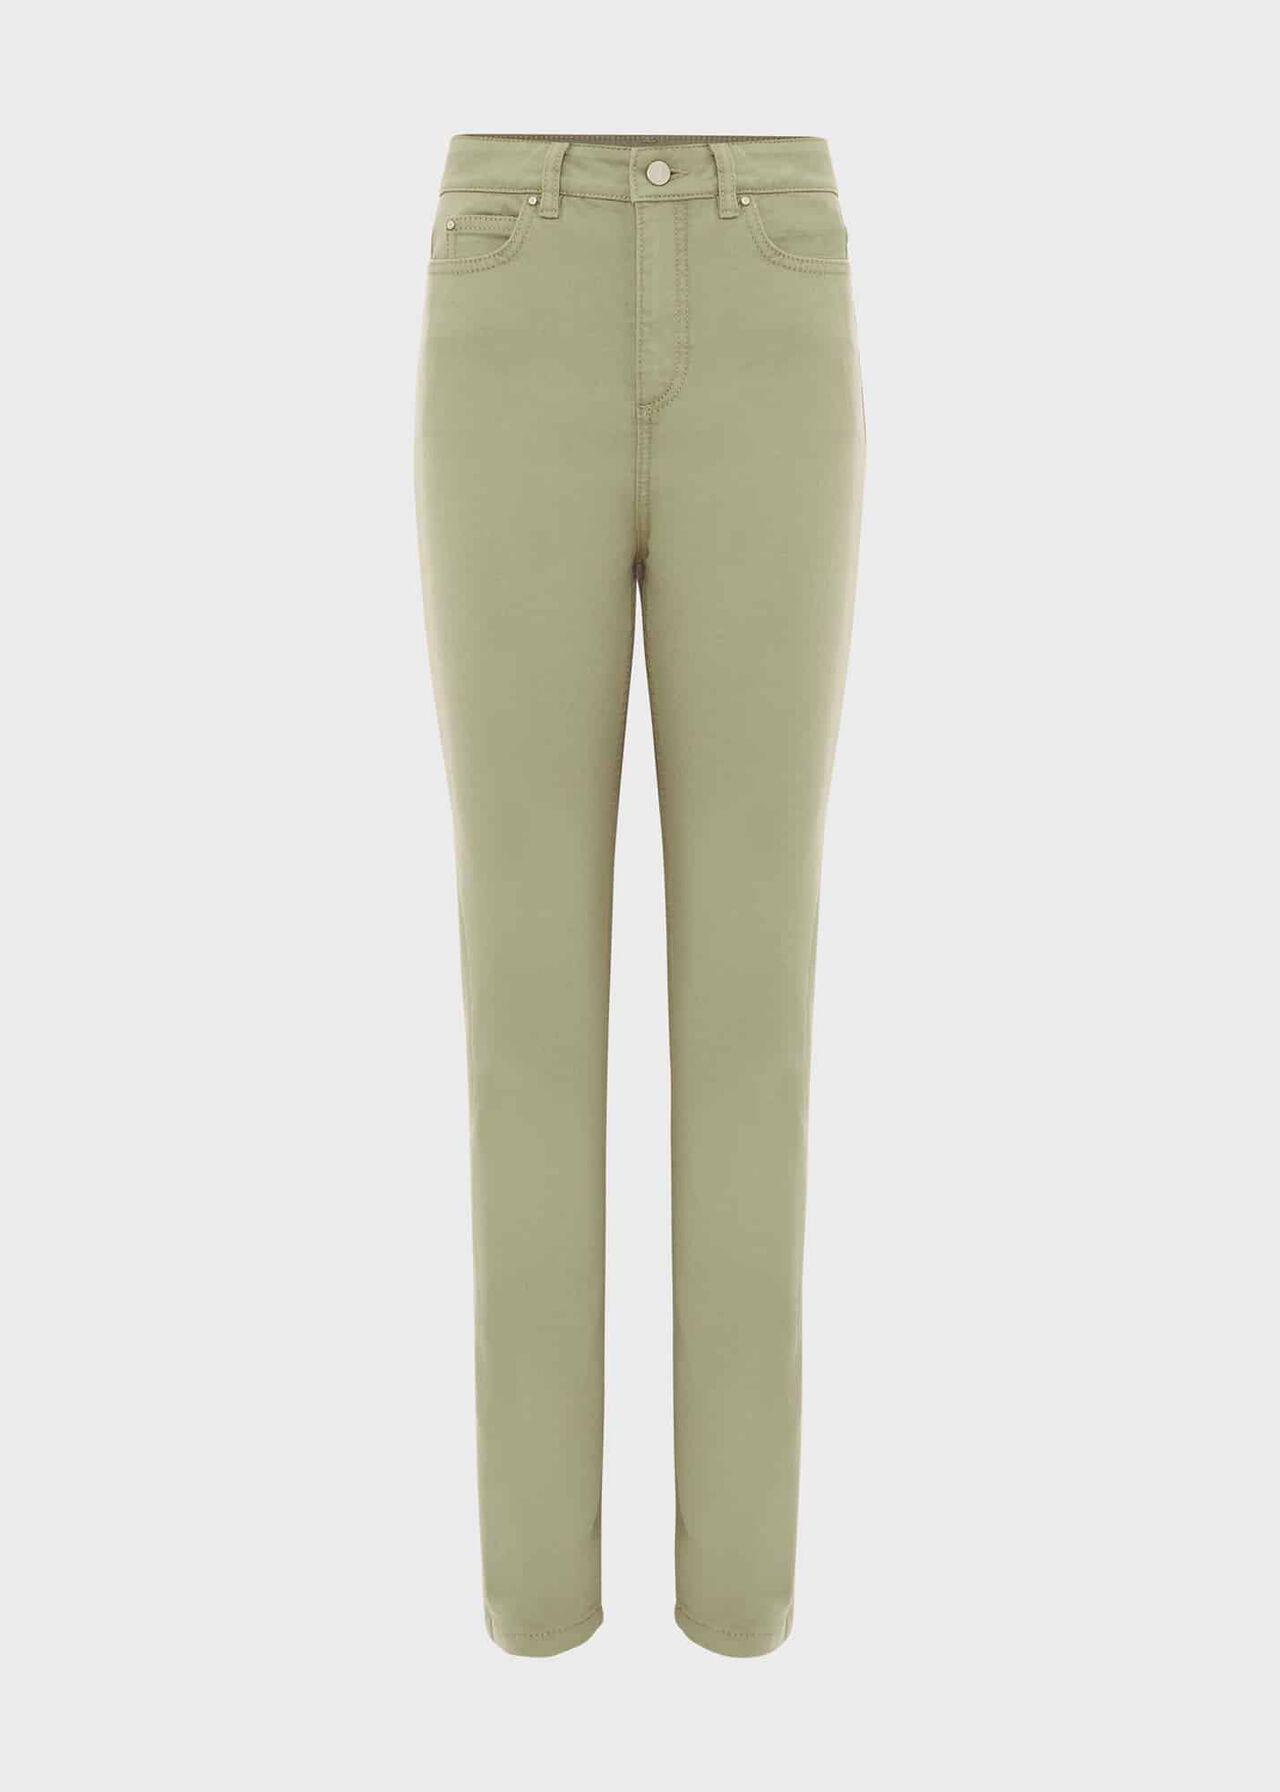 Gia Sculpting Jeans, Light Green, hi-res